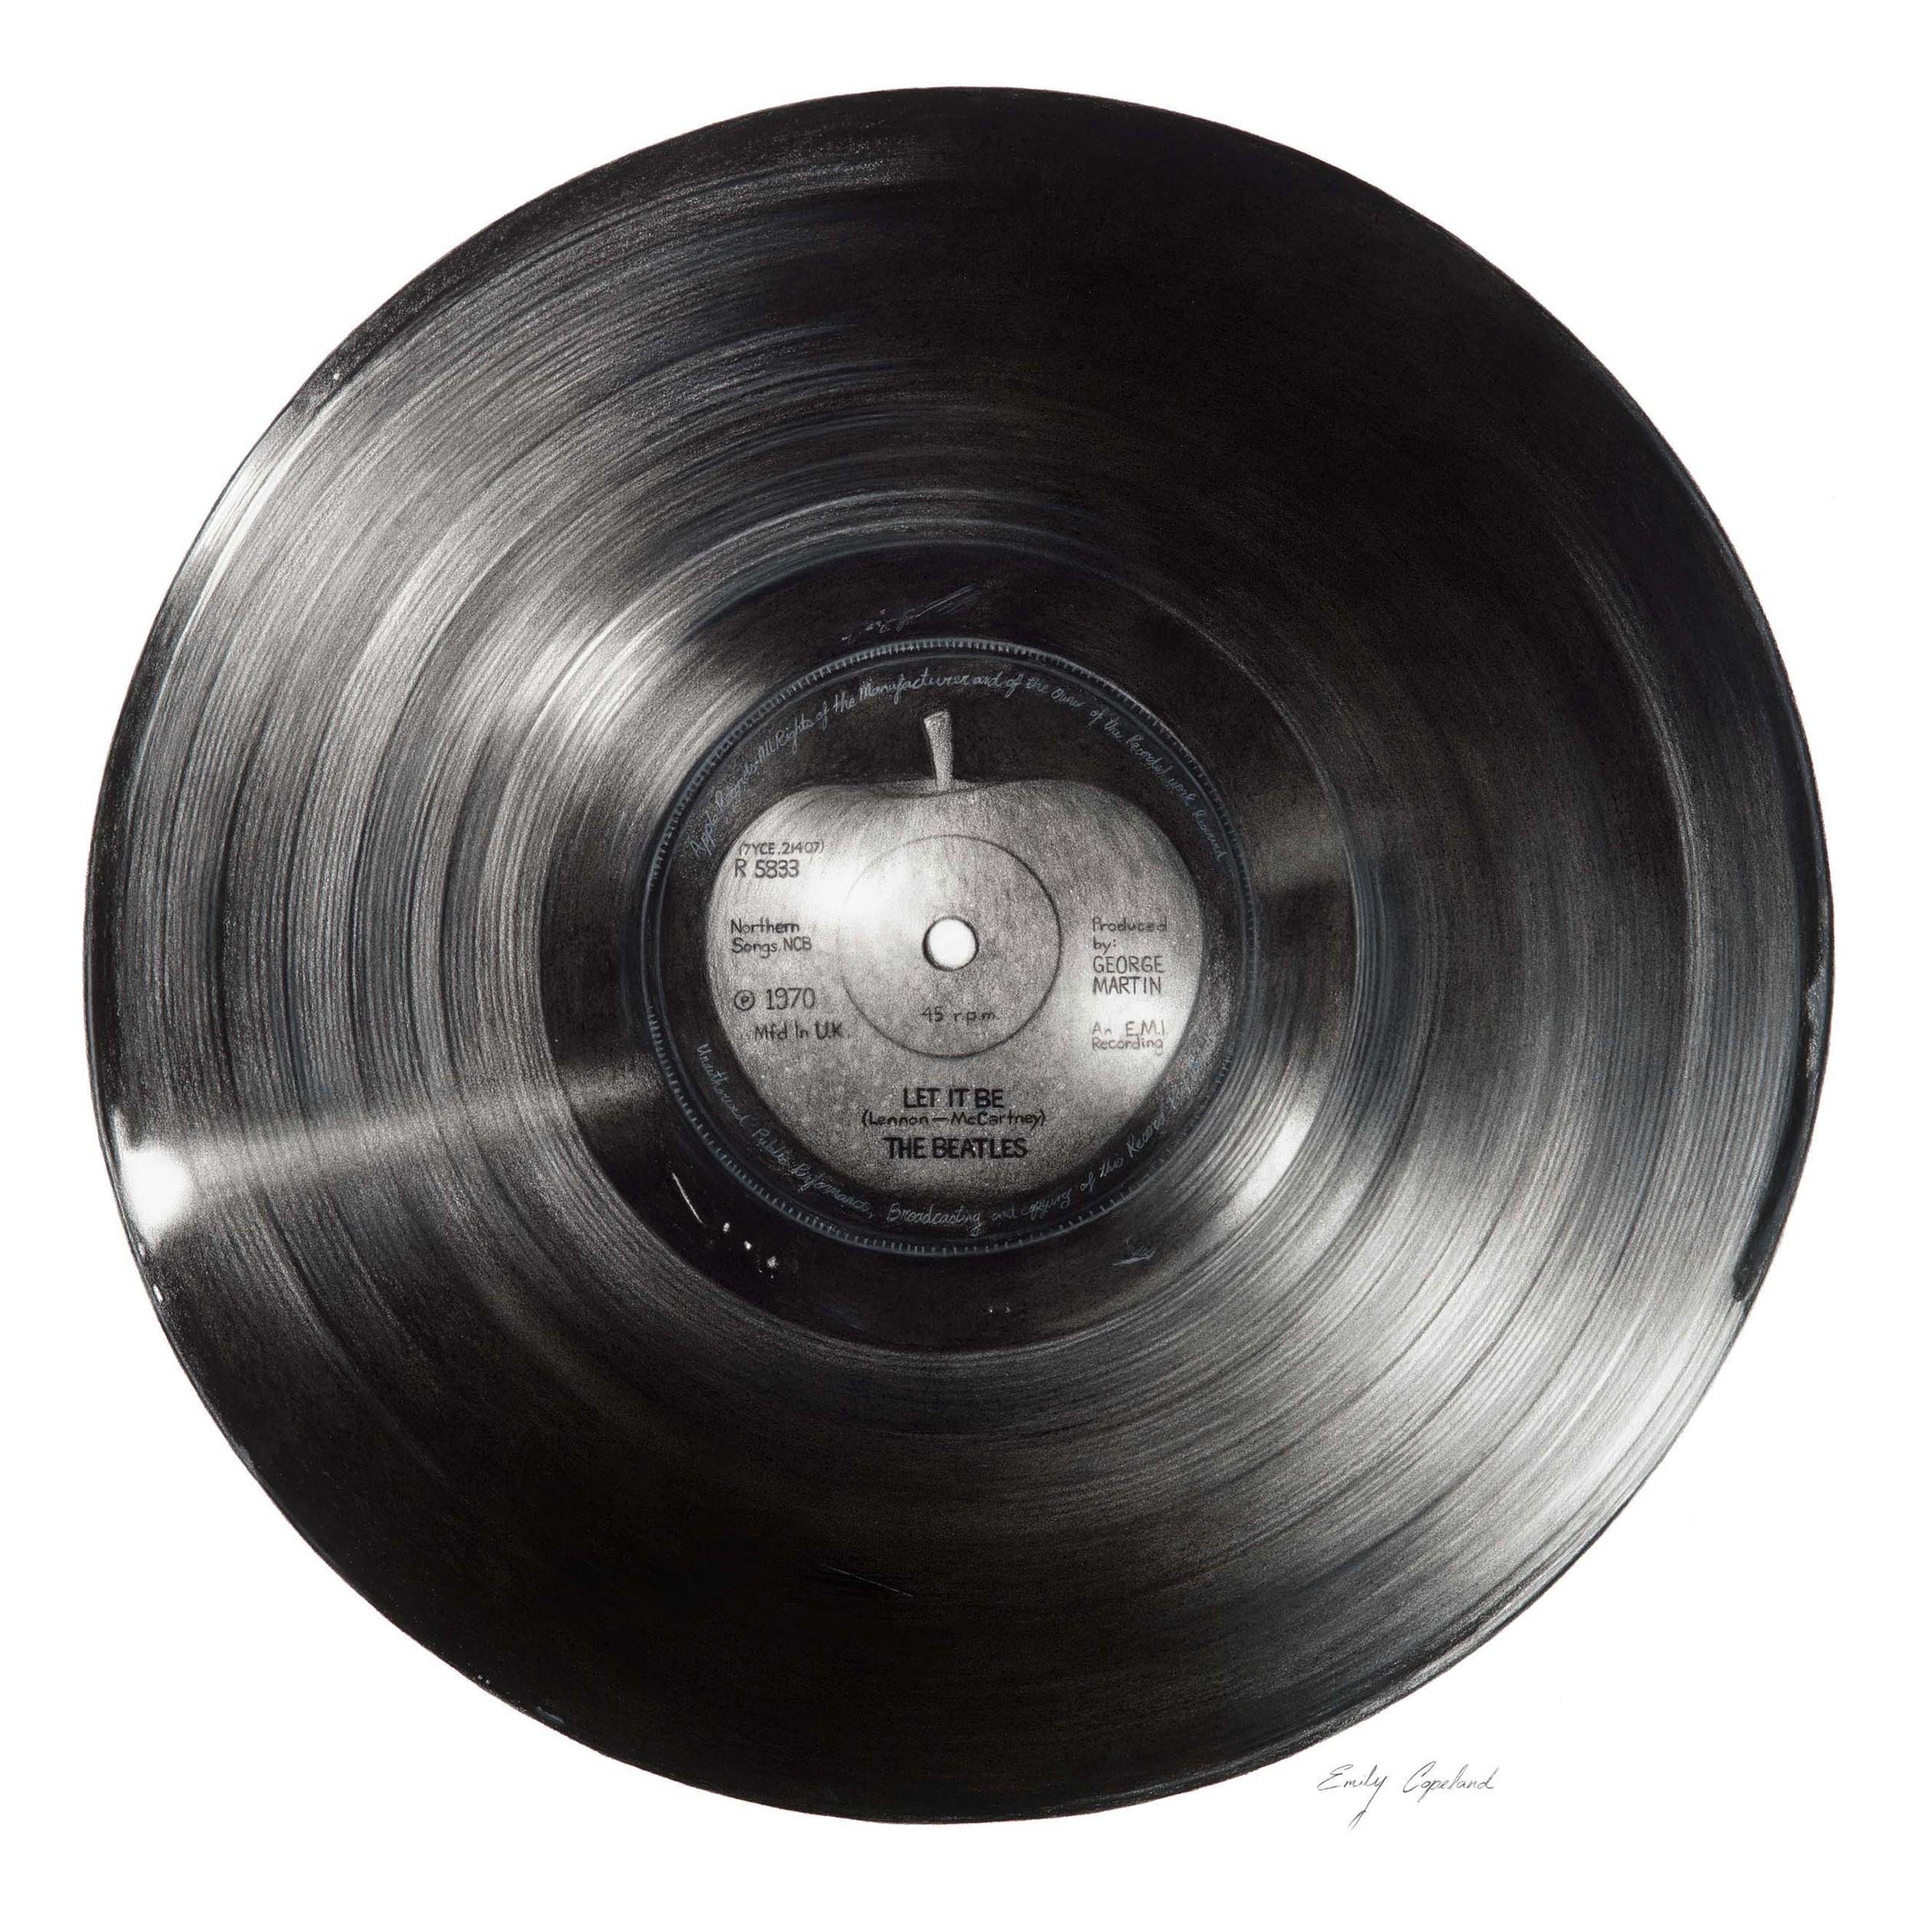 Charcoal Drawing of a Beatles Vinyl